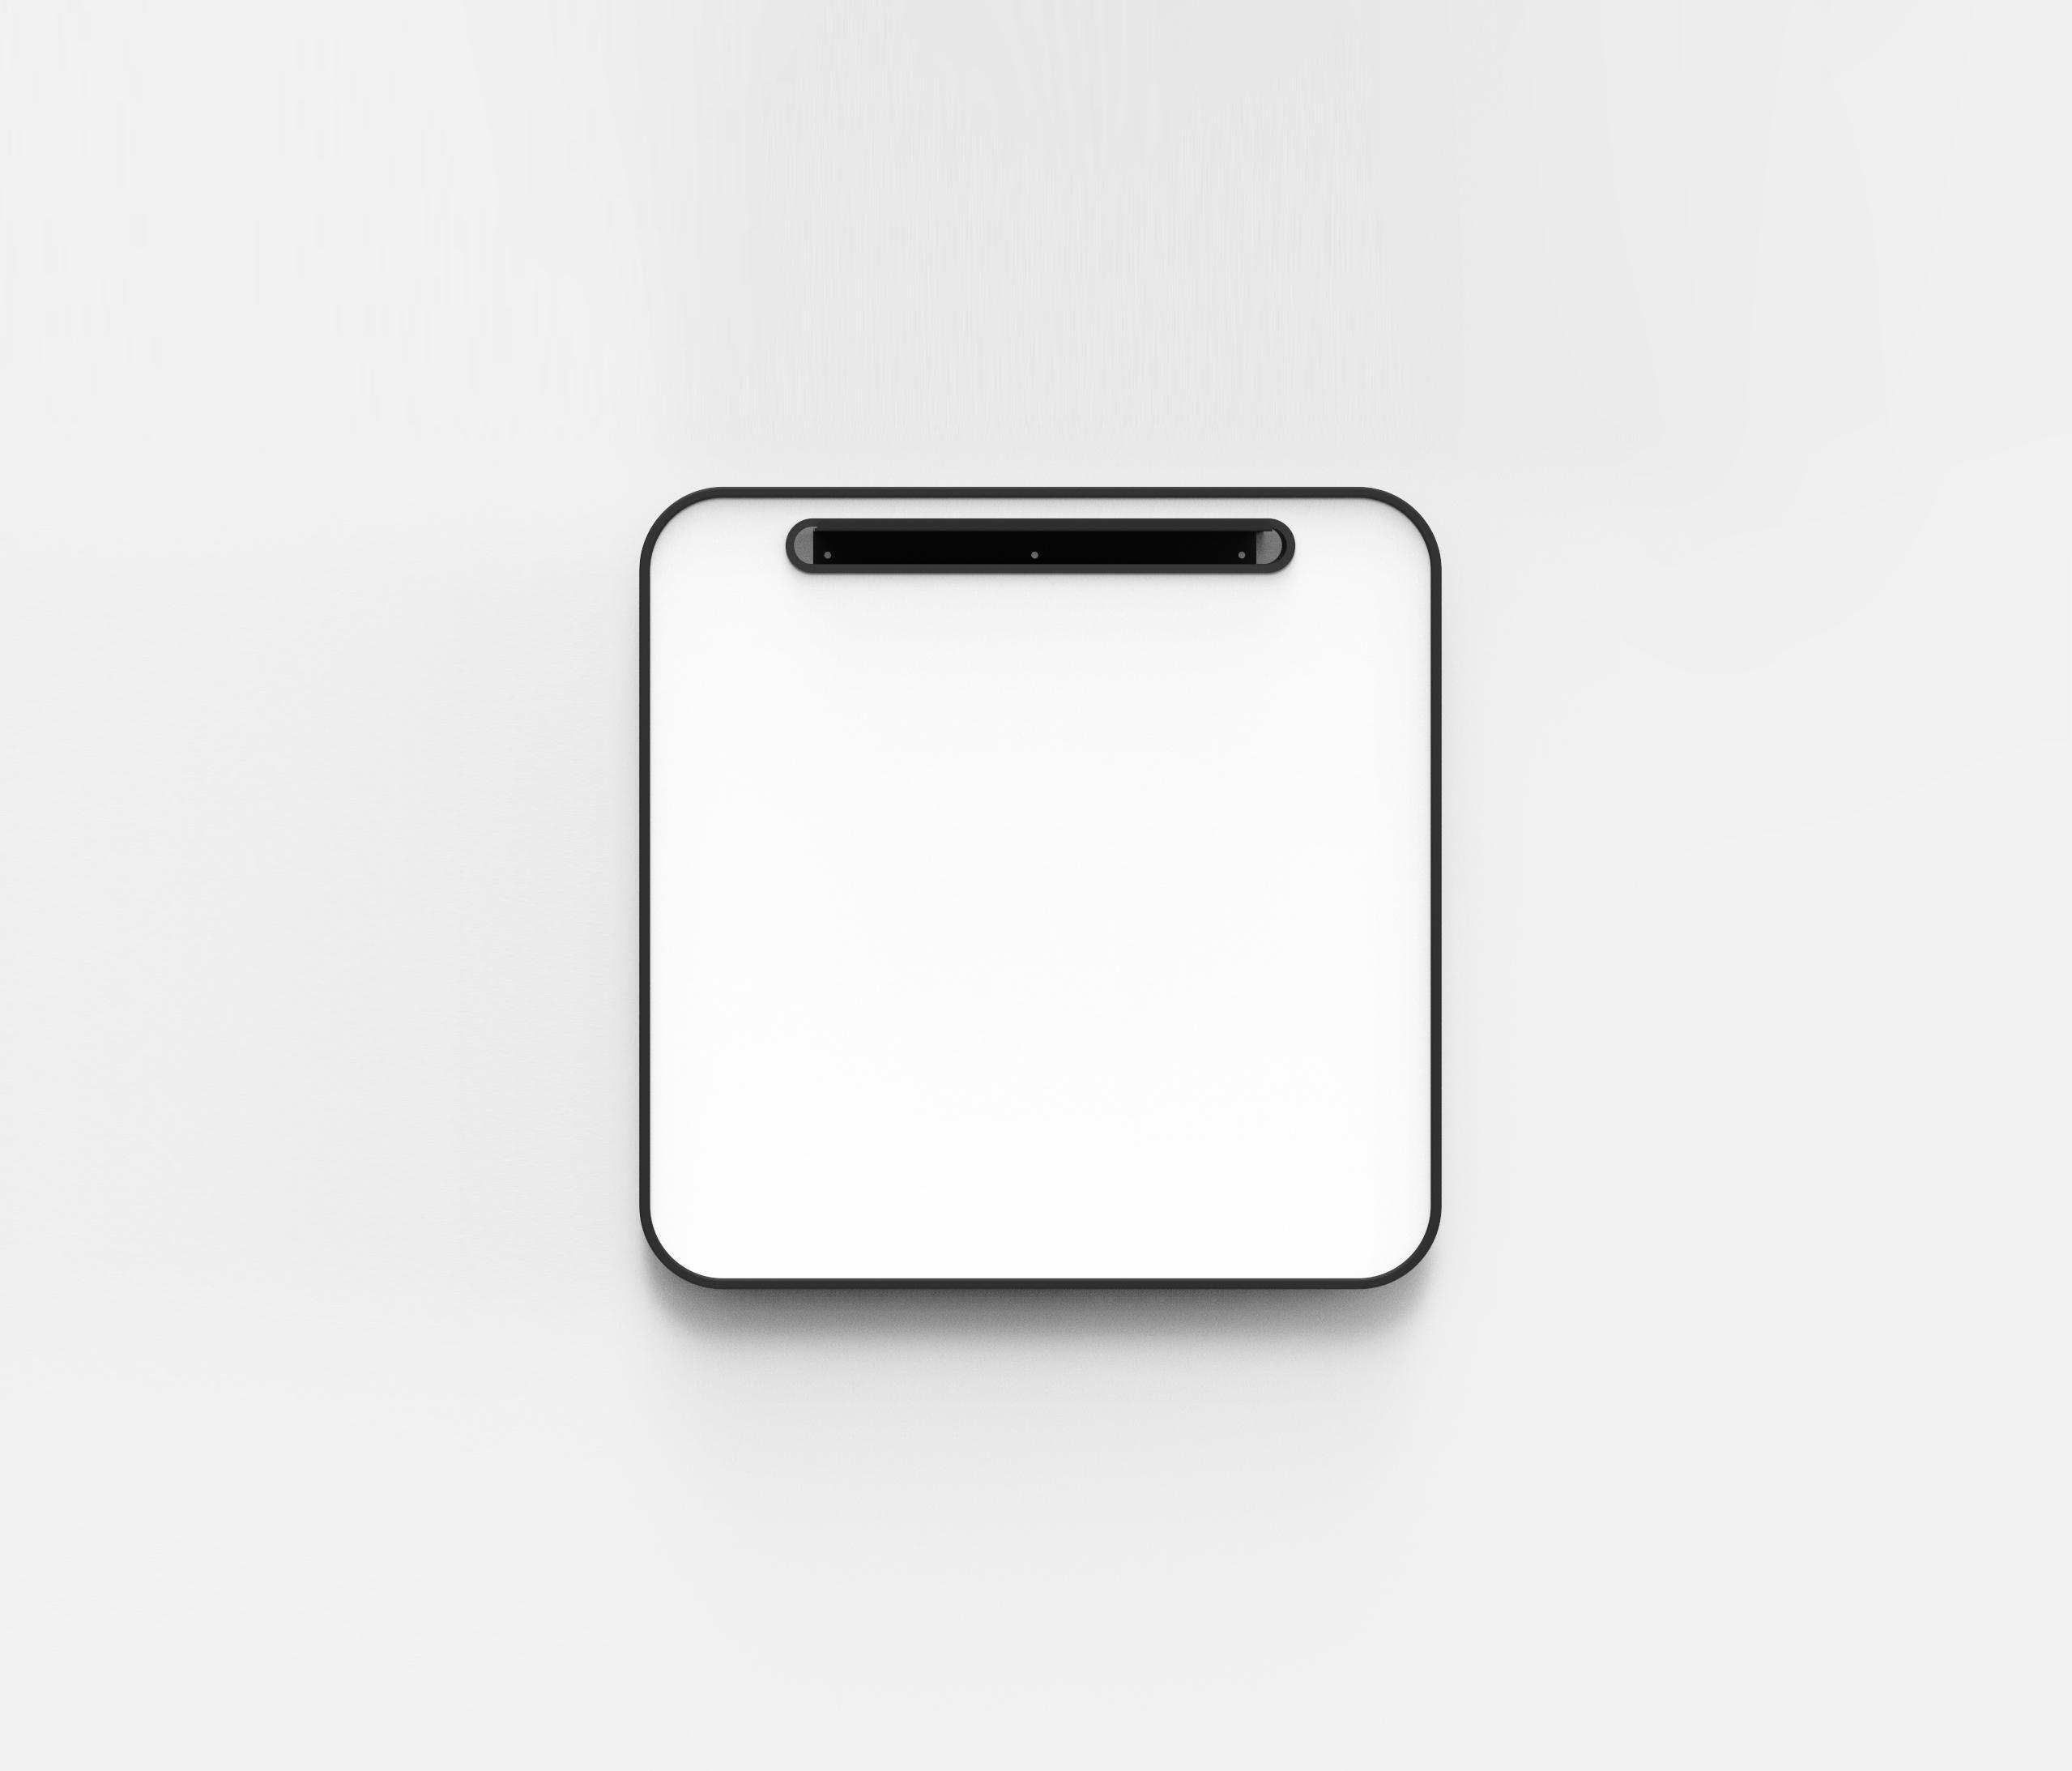 Bathroom Paneling Whiteboard 201x300.jpg Note Whiteboard by Lintex | Flip charts - Writing boards